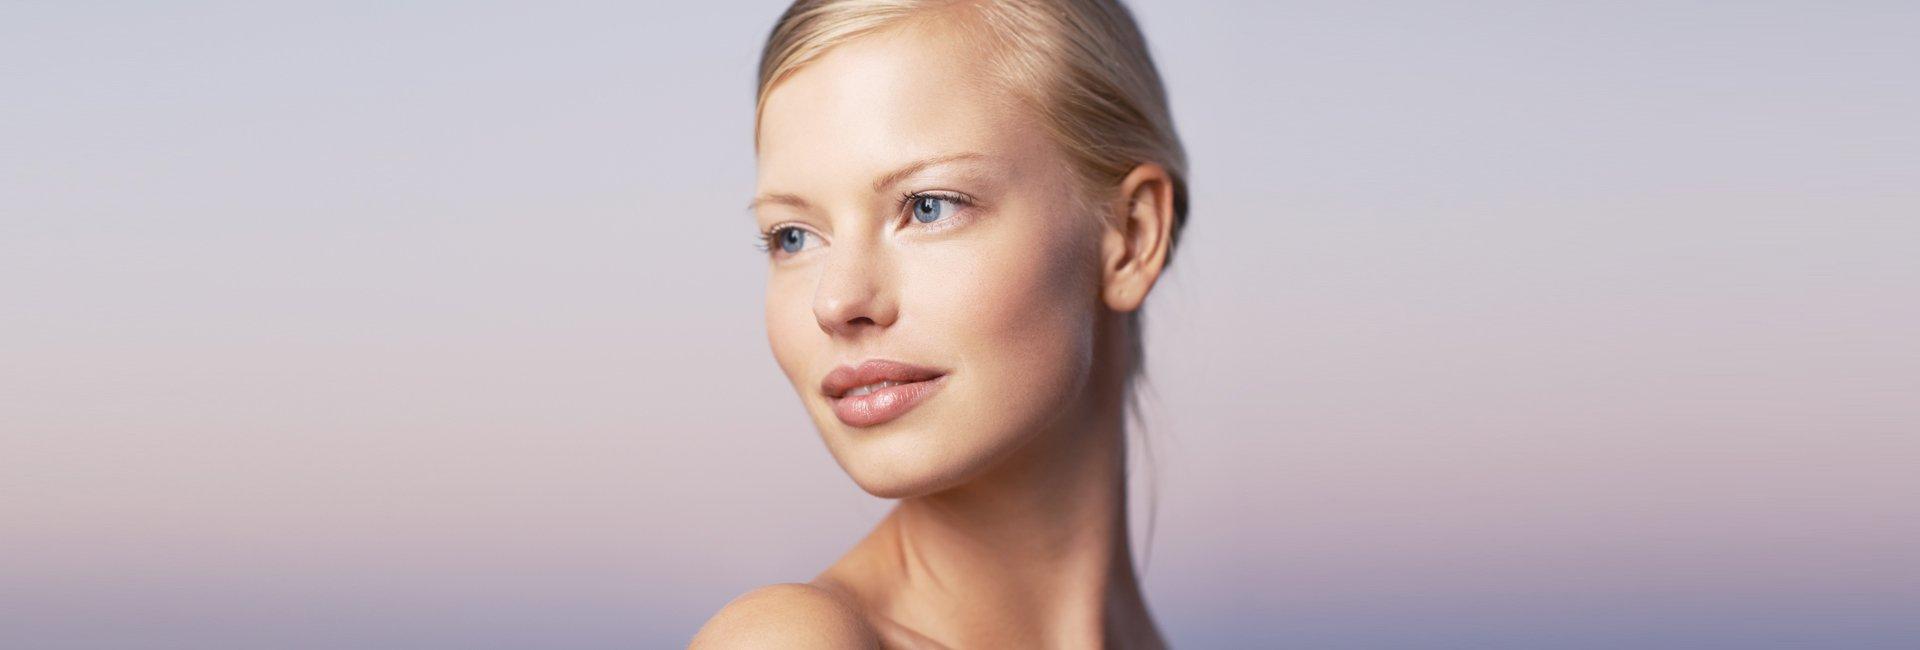 skincare techniques